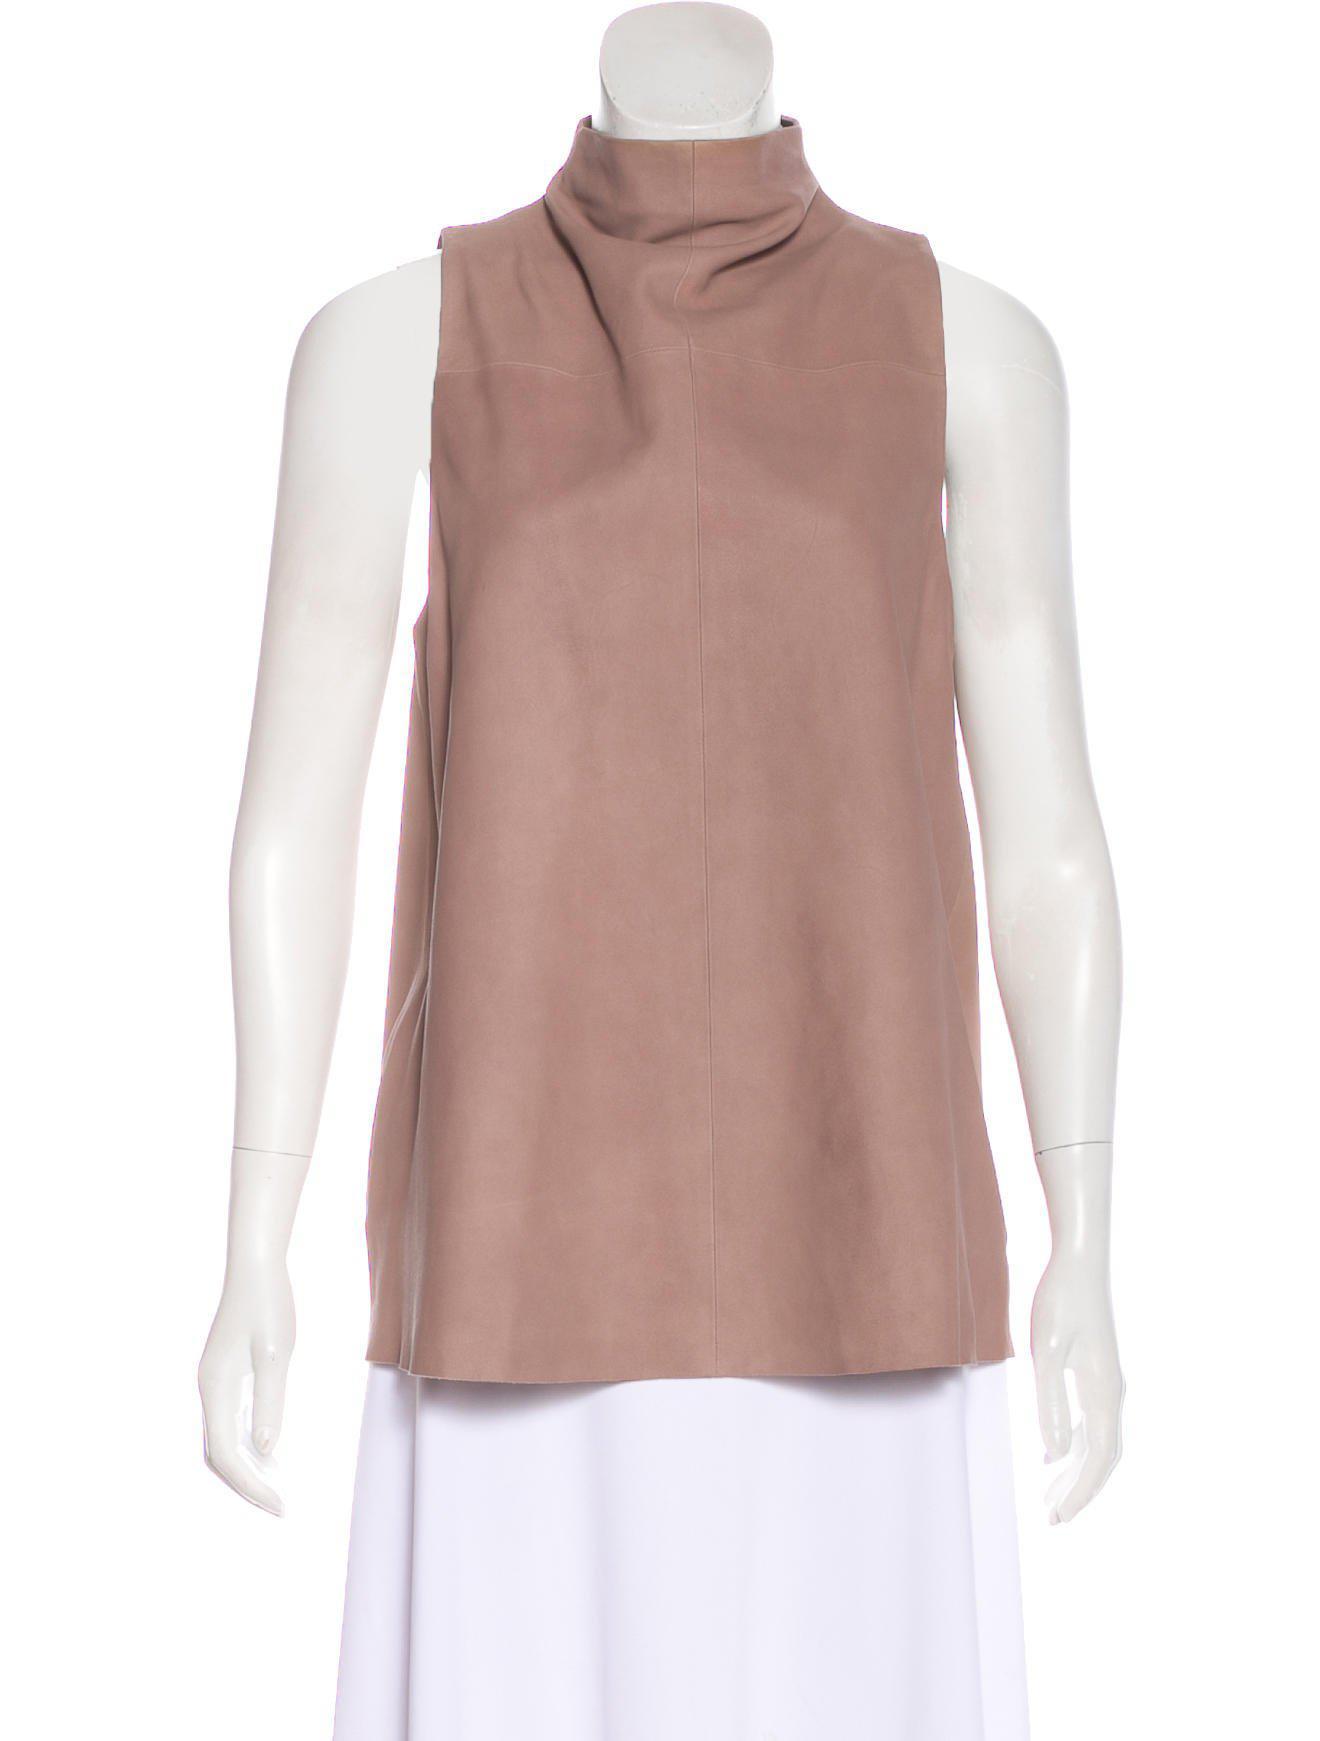 Veda Leather Mock Neck Top Wiki Cheap Online Fashionable For Sale Best Wholesale Sale Online Footlocker Finishline Online qTqBILFKa